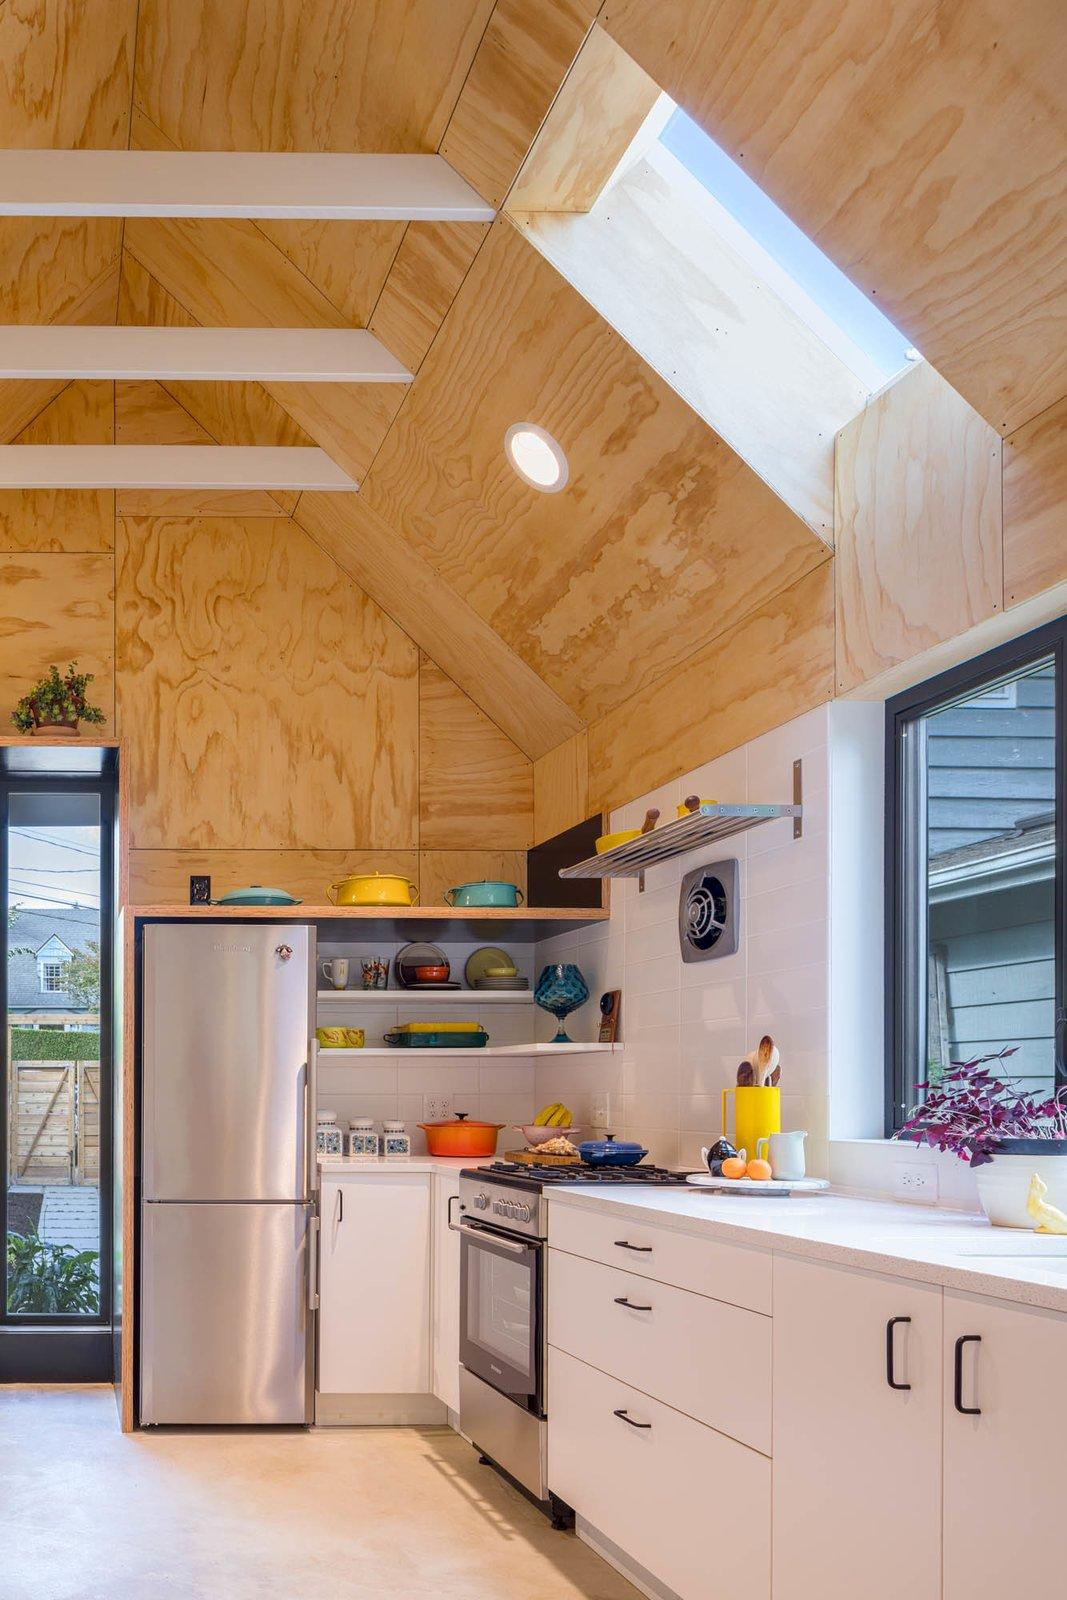 Kitchen, Undermount Sink, Concrete Floor, Recessed Lighting, and White Cabinet Kitchen  Granny Pad